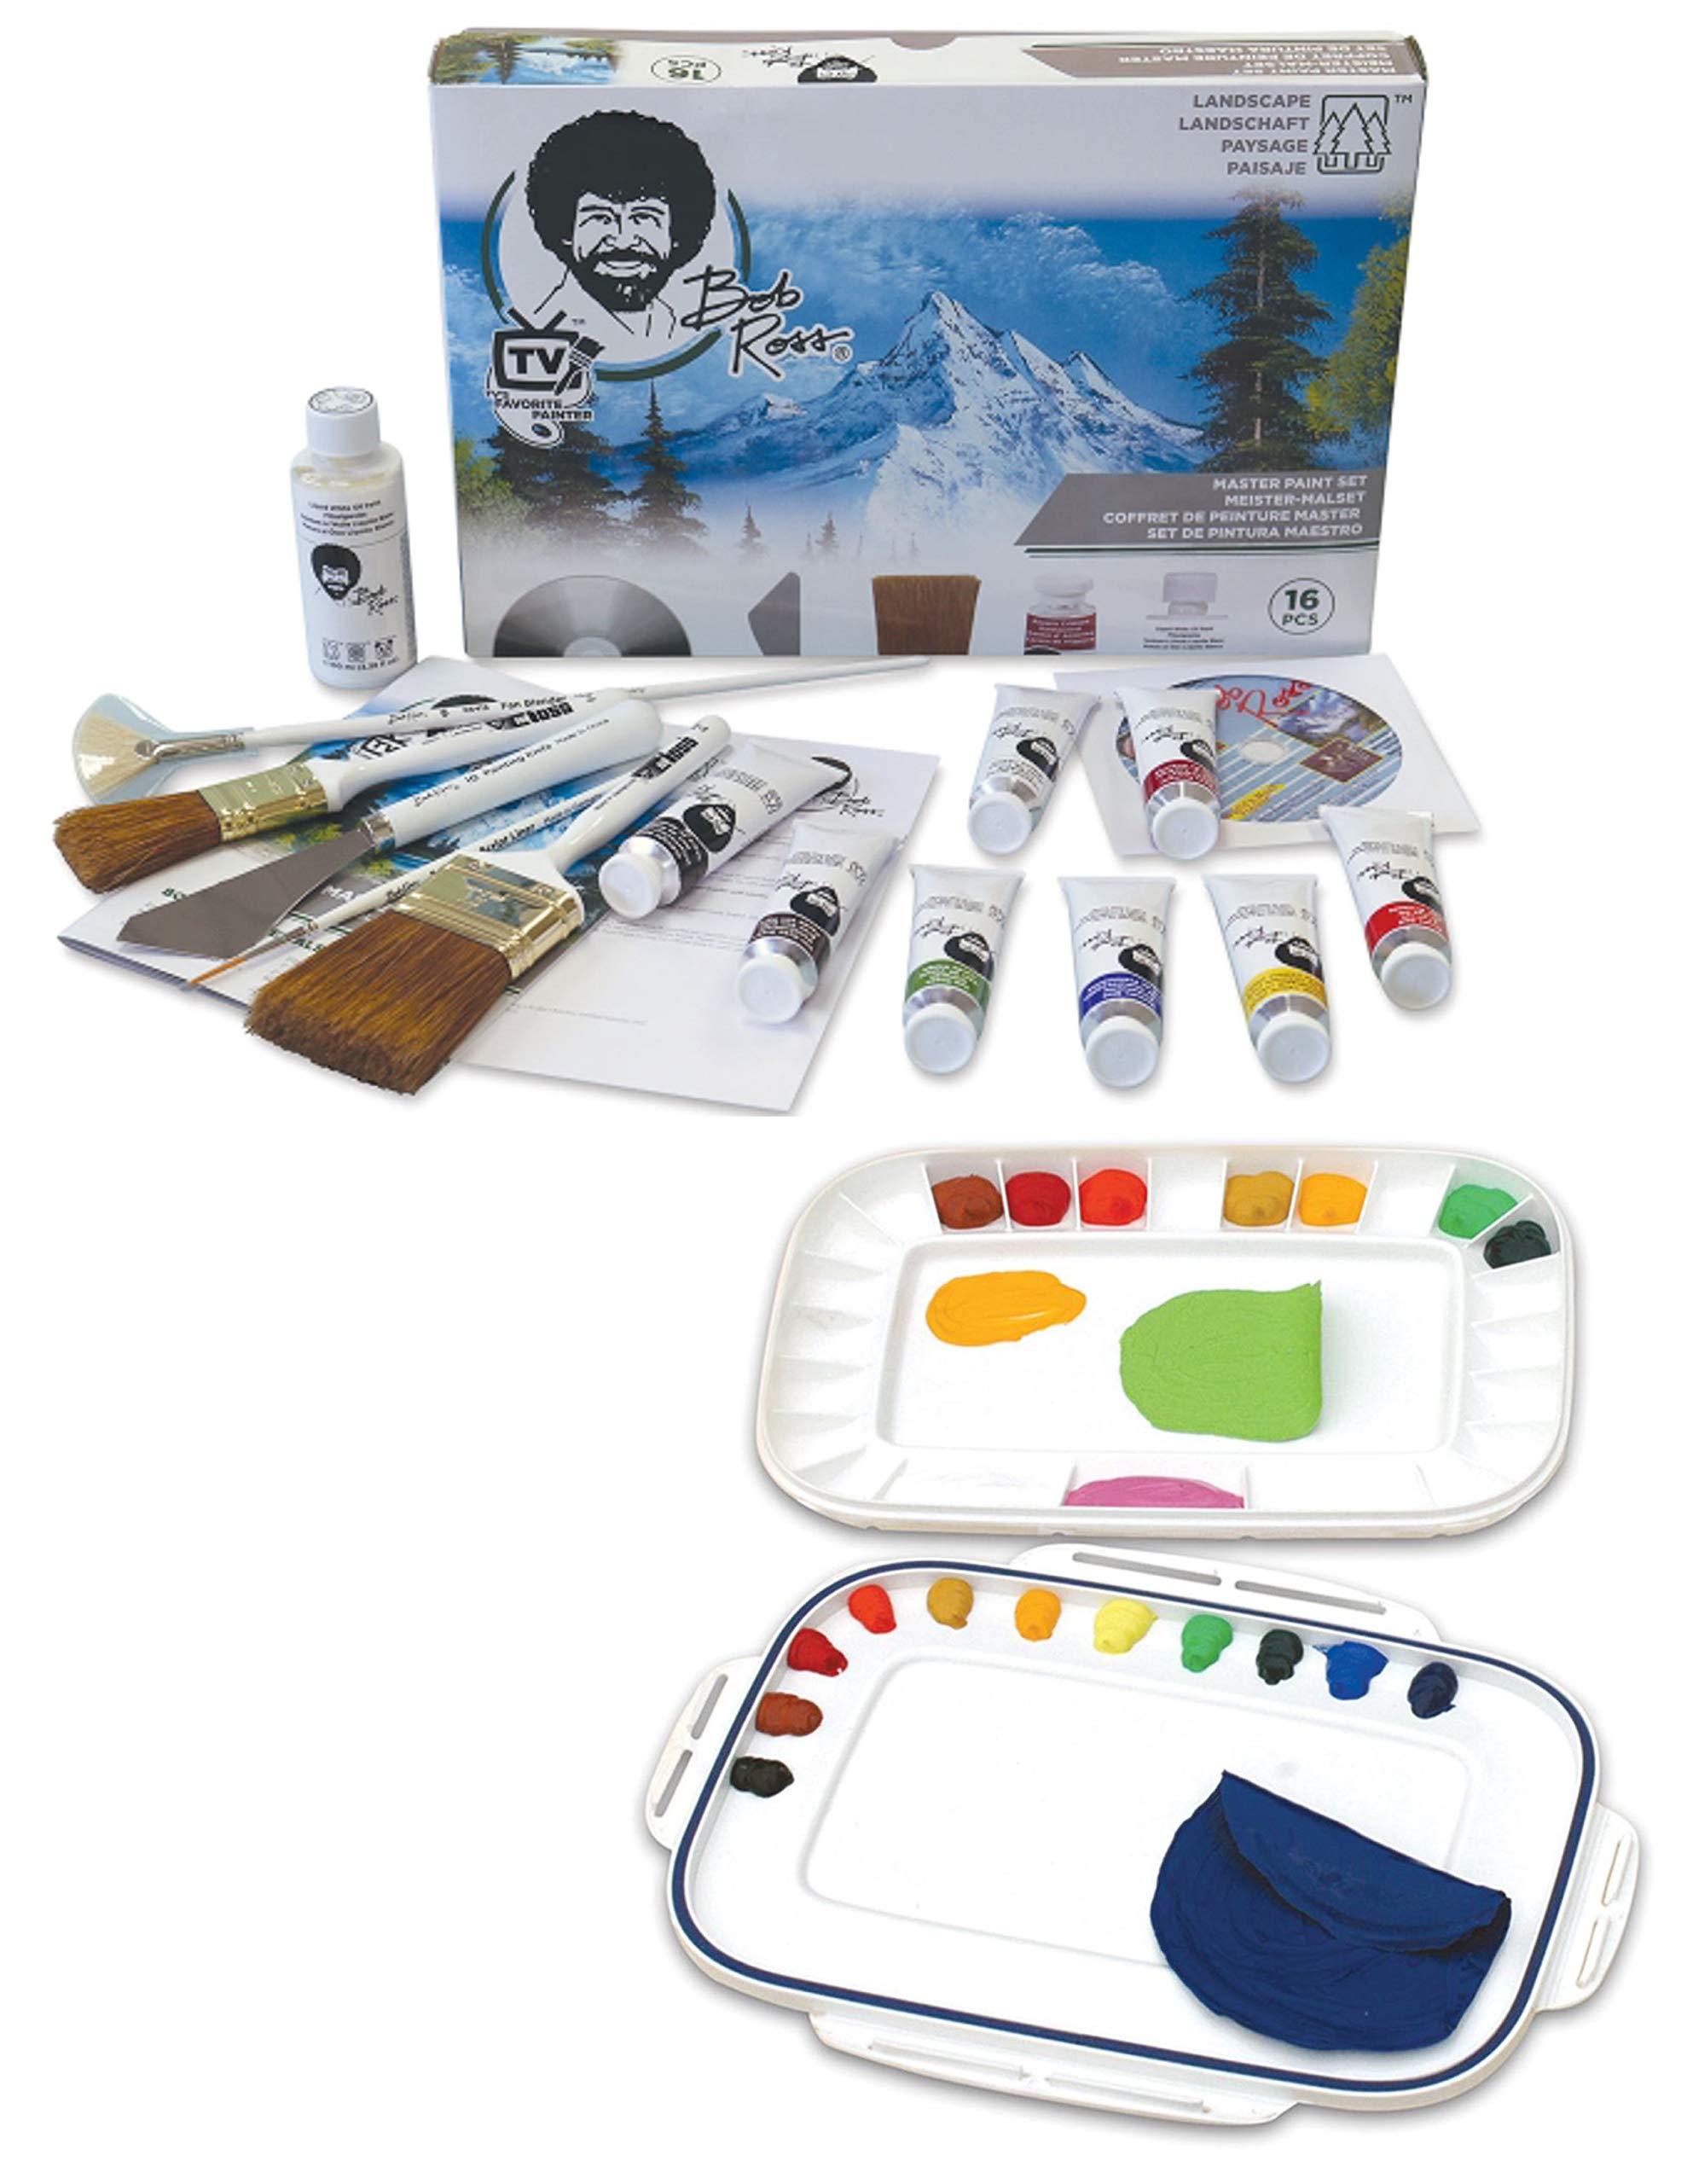 Bob Ross Painting Kit - Martin/F. Weber Bob Ross Master Paint Set - Martin/F. Weber Artelier Paint Palette/Storage/Travel kit by Bob Ross